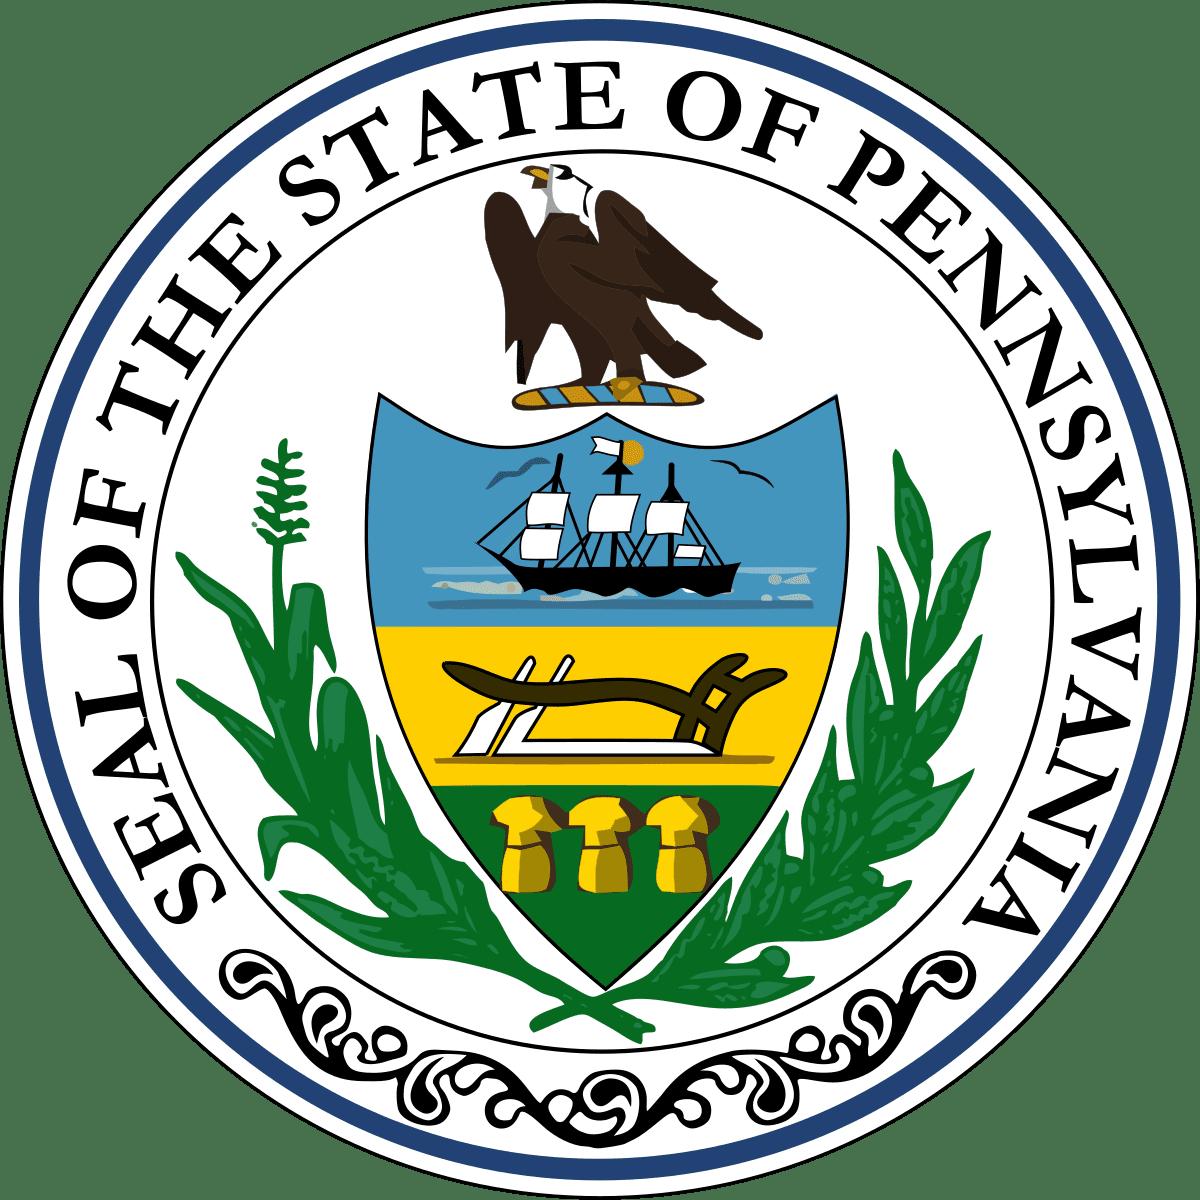 State of Pennsylvania